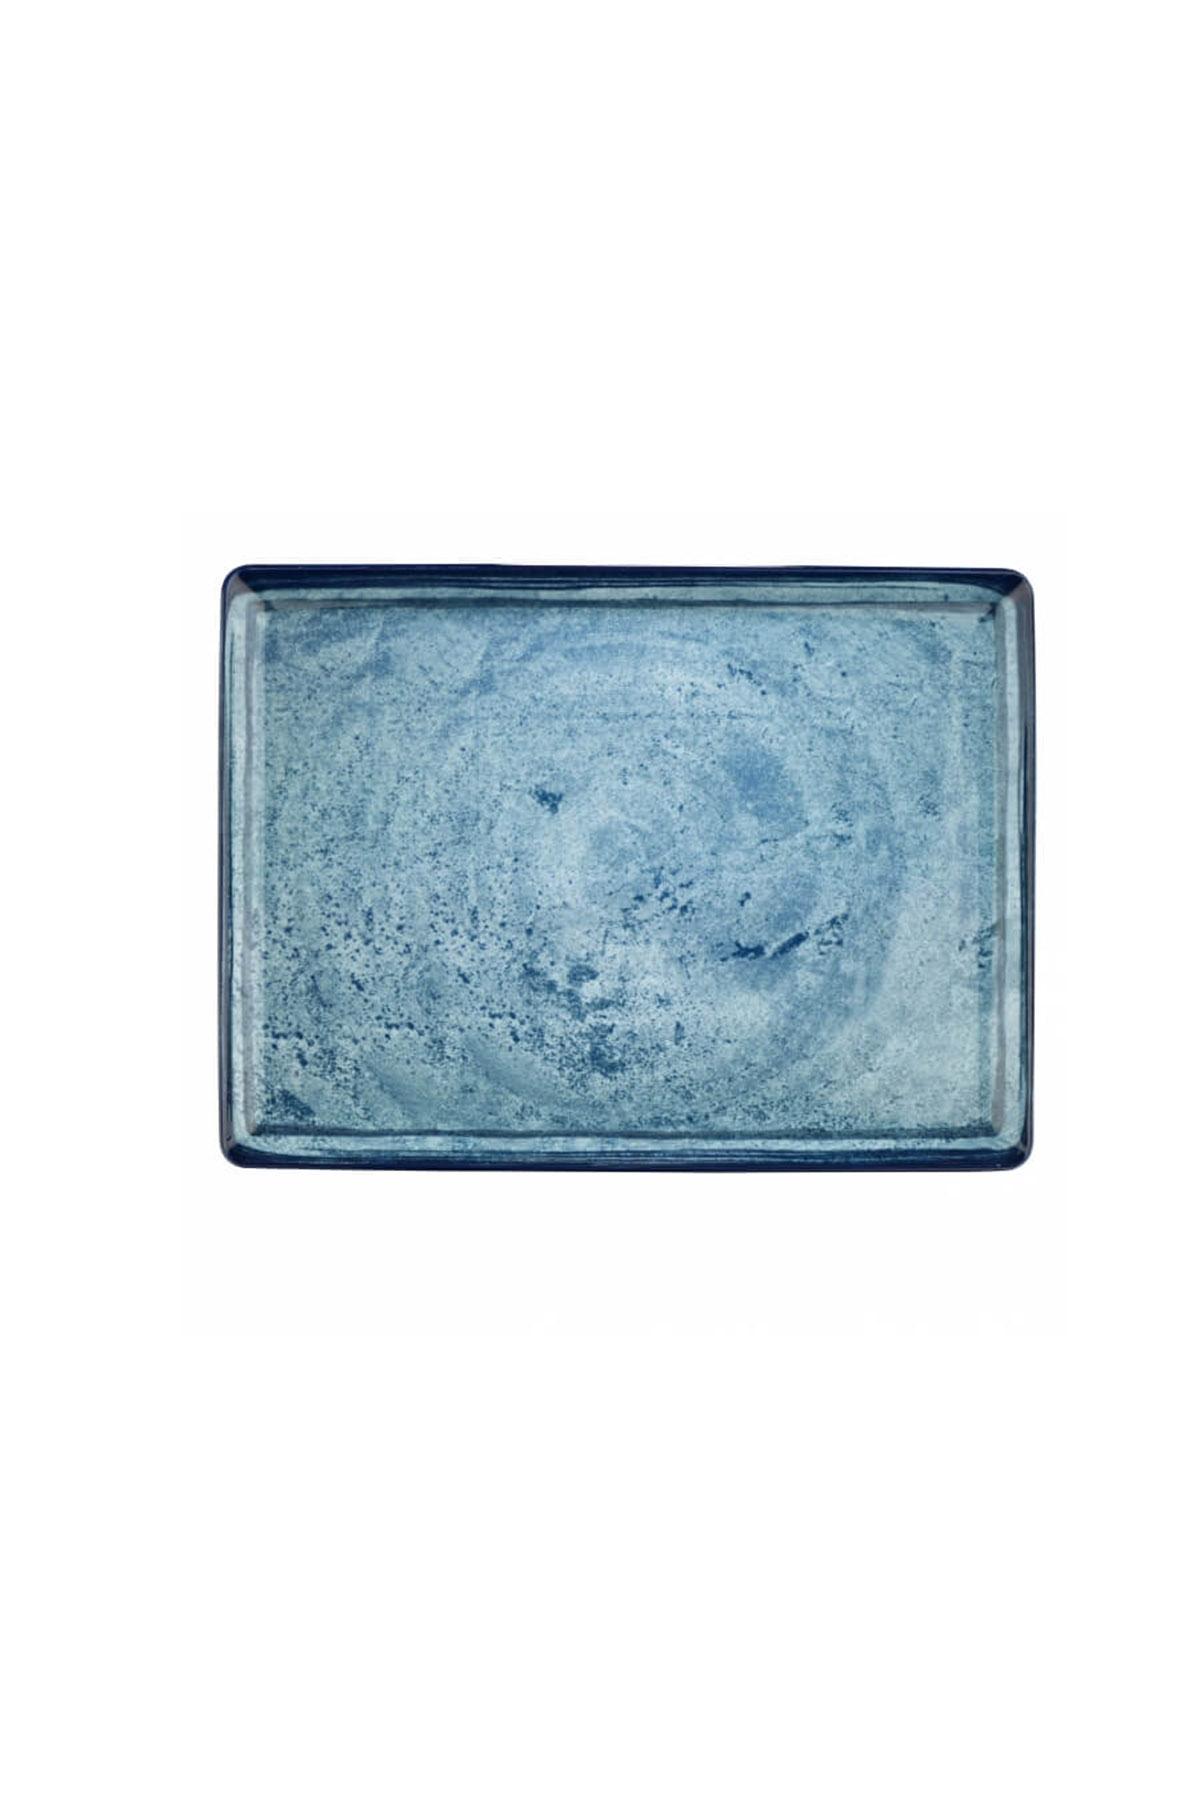 Kütahya Porselen Nanokrem 27x20 cm Düz Tabak 890003